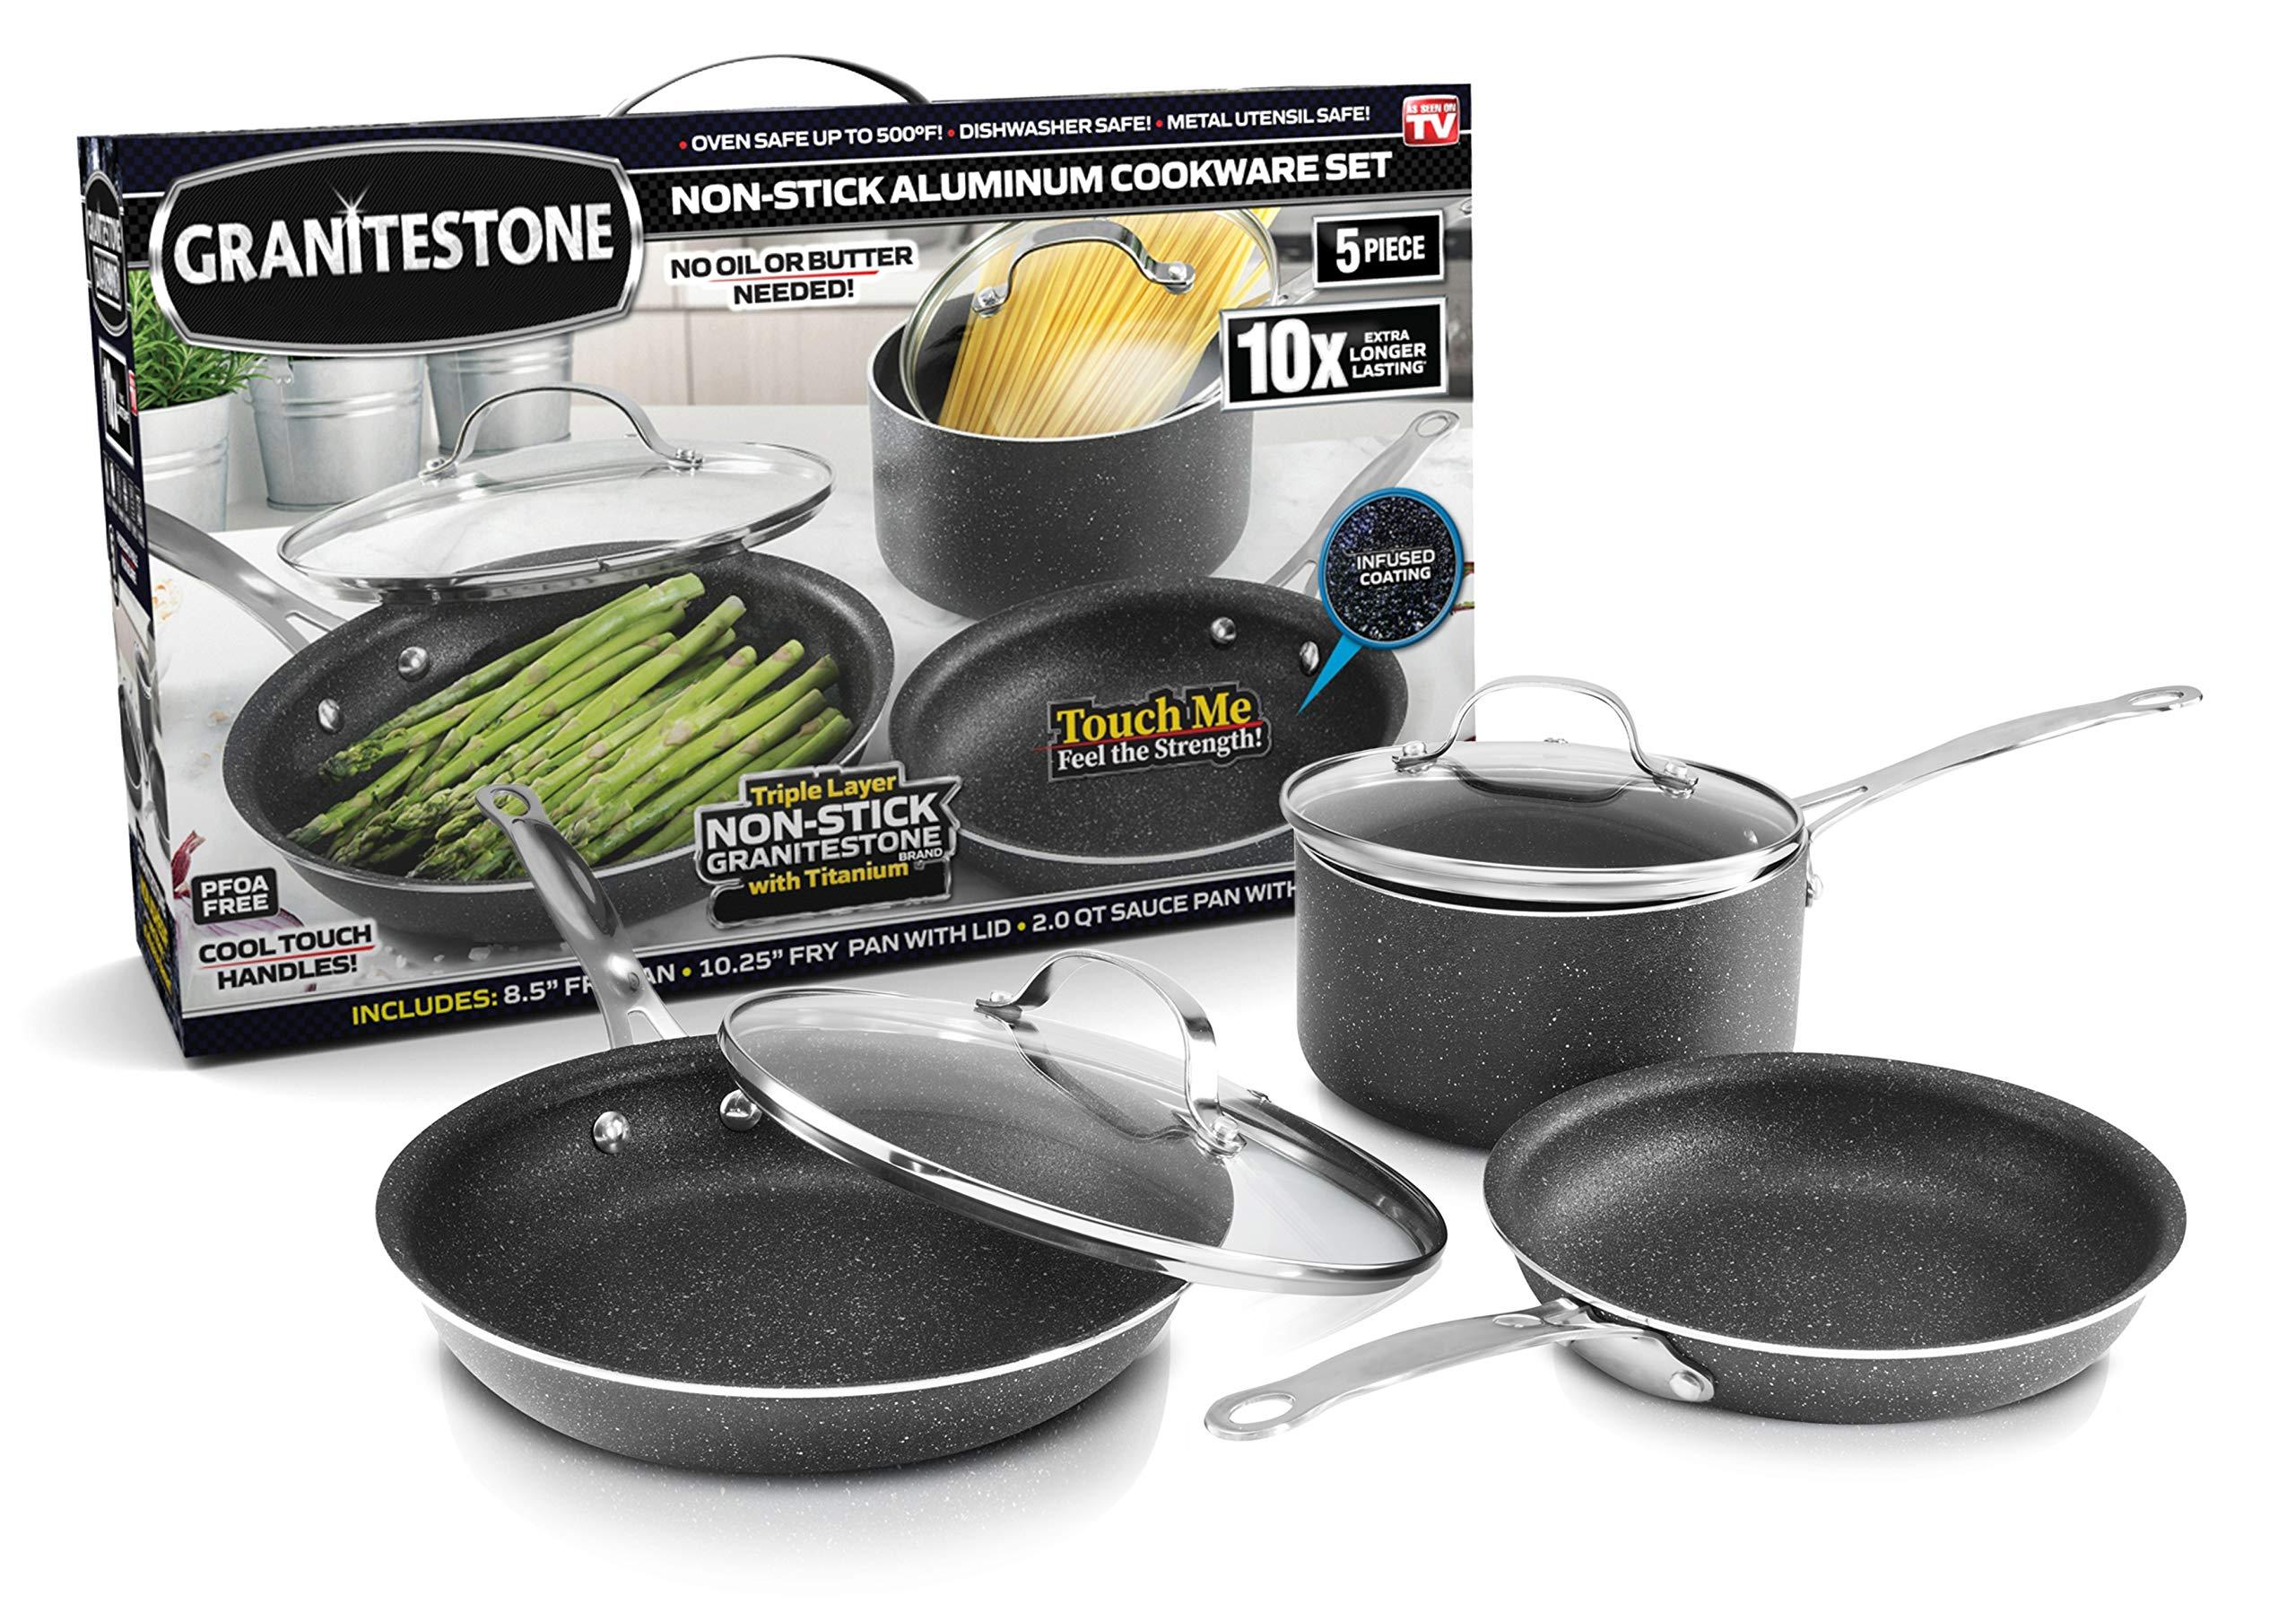 GRANITESTONE 5 Piece Cookware Set, Scratch-Proof, Nonstick Granite-coated, PFOA-Free As Seen On TV